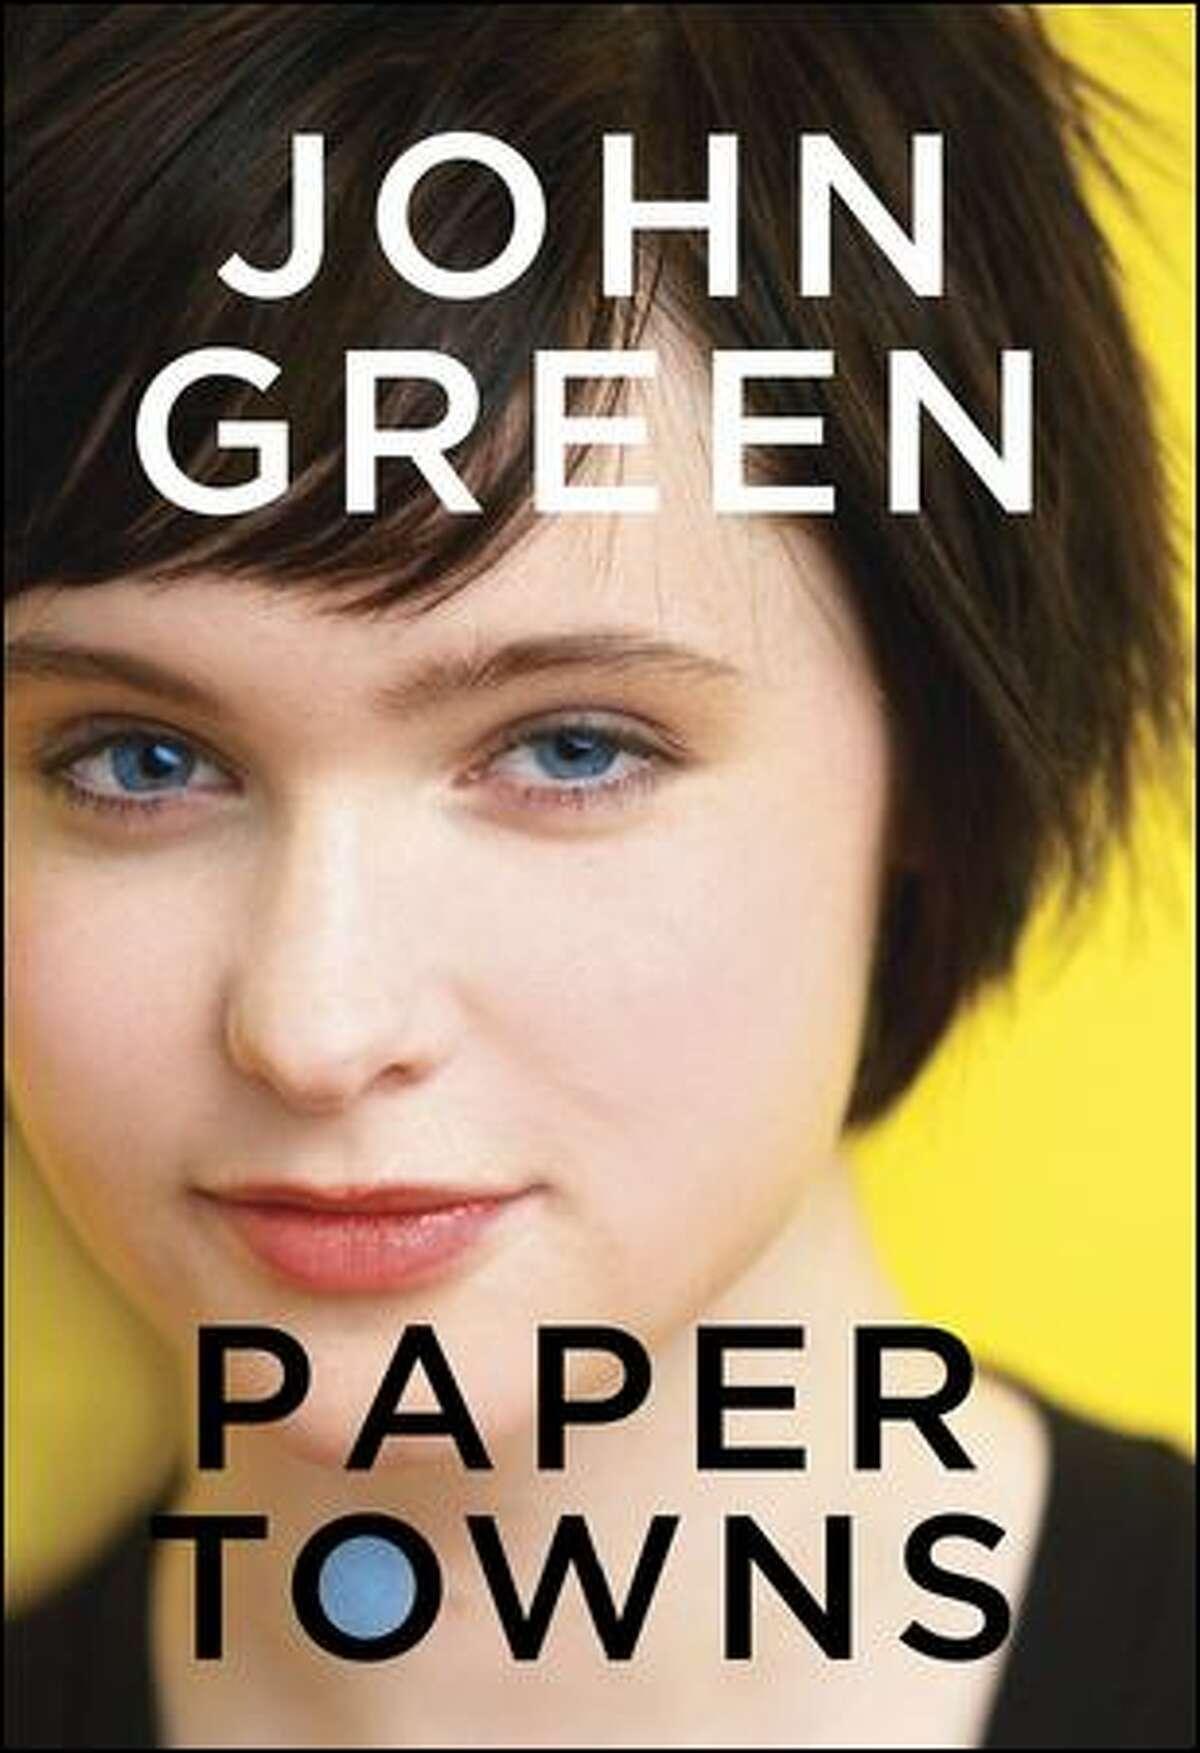 John Green's latest,